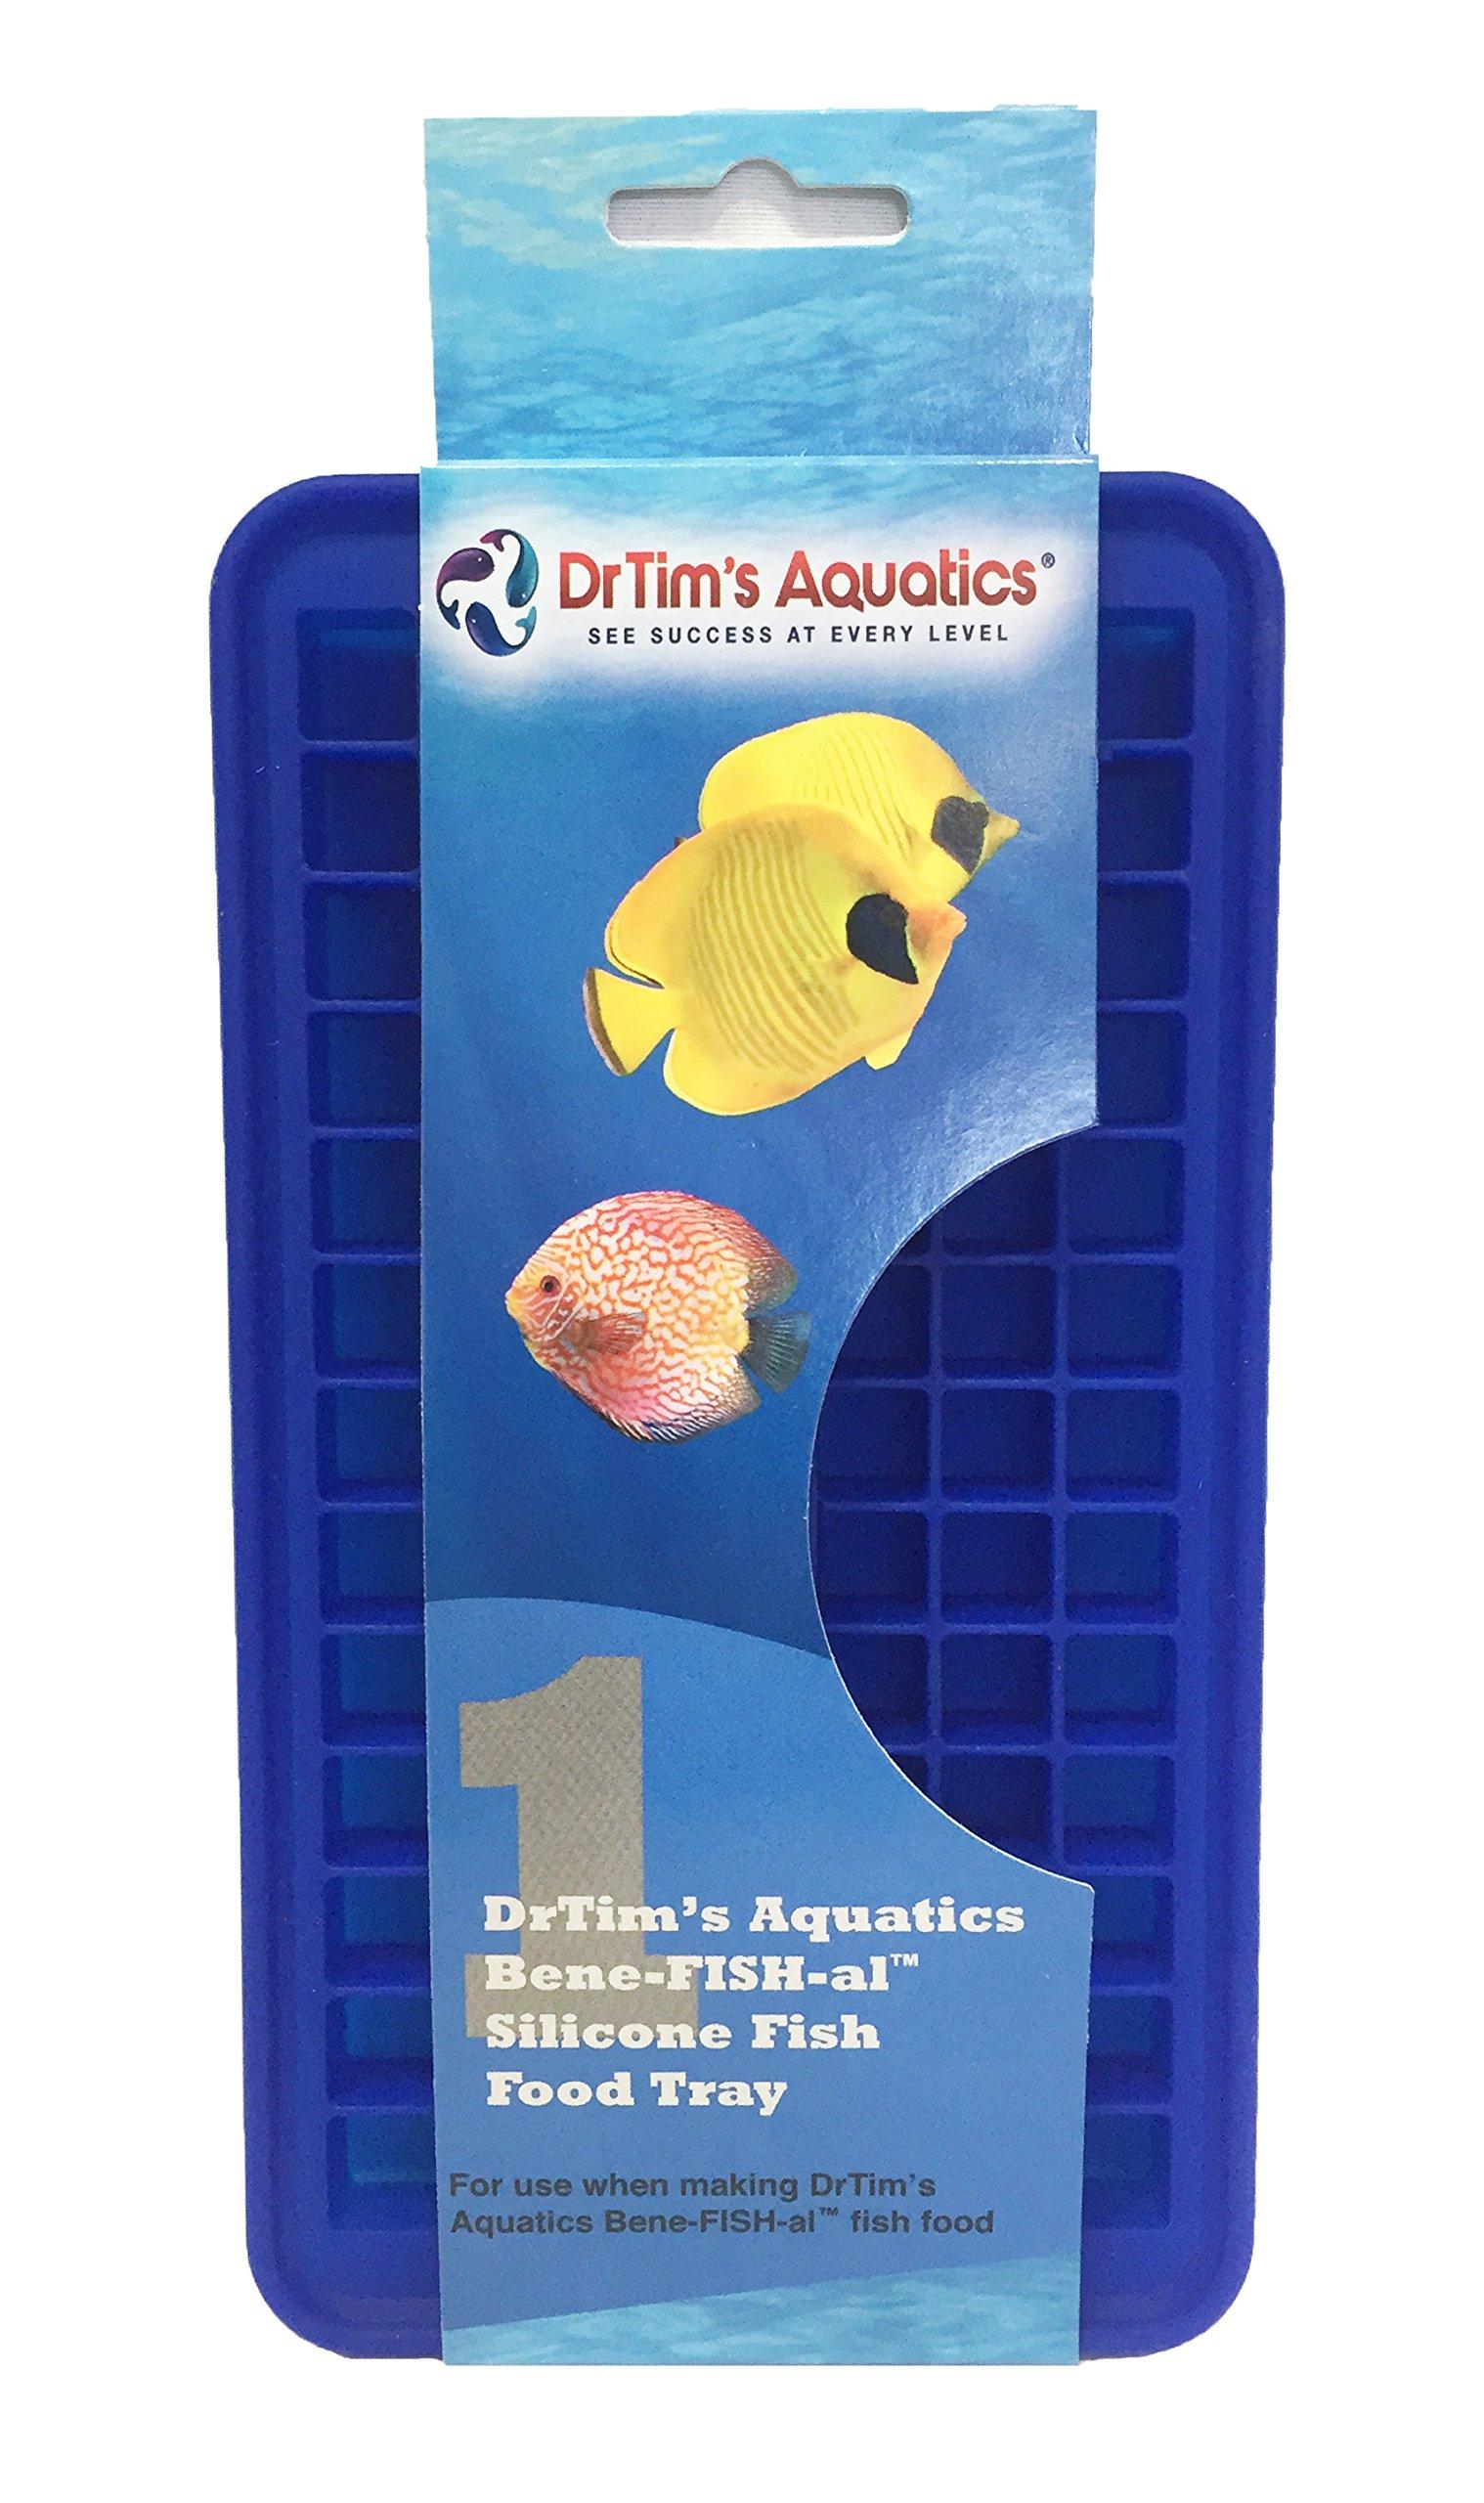 DrTim's Aquatics 022217 Bene-Fish-Al Fish Food 90 Cube Fish Food Tray, 90 Cube Tray, 1Piece